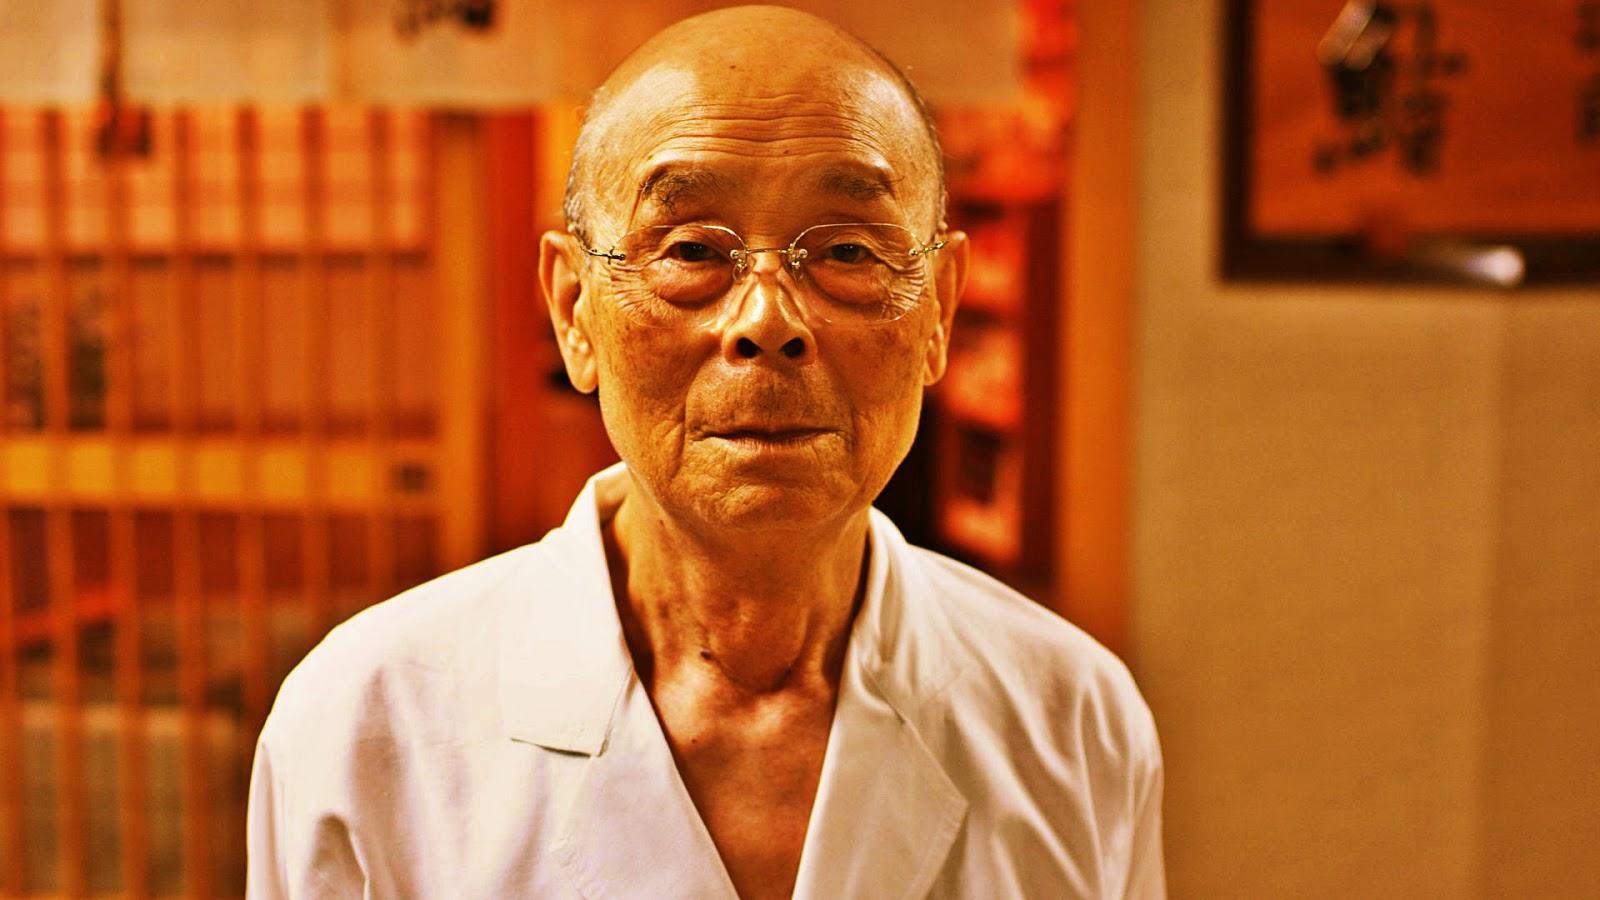 Jiro Ono